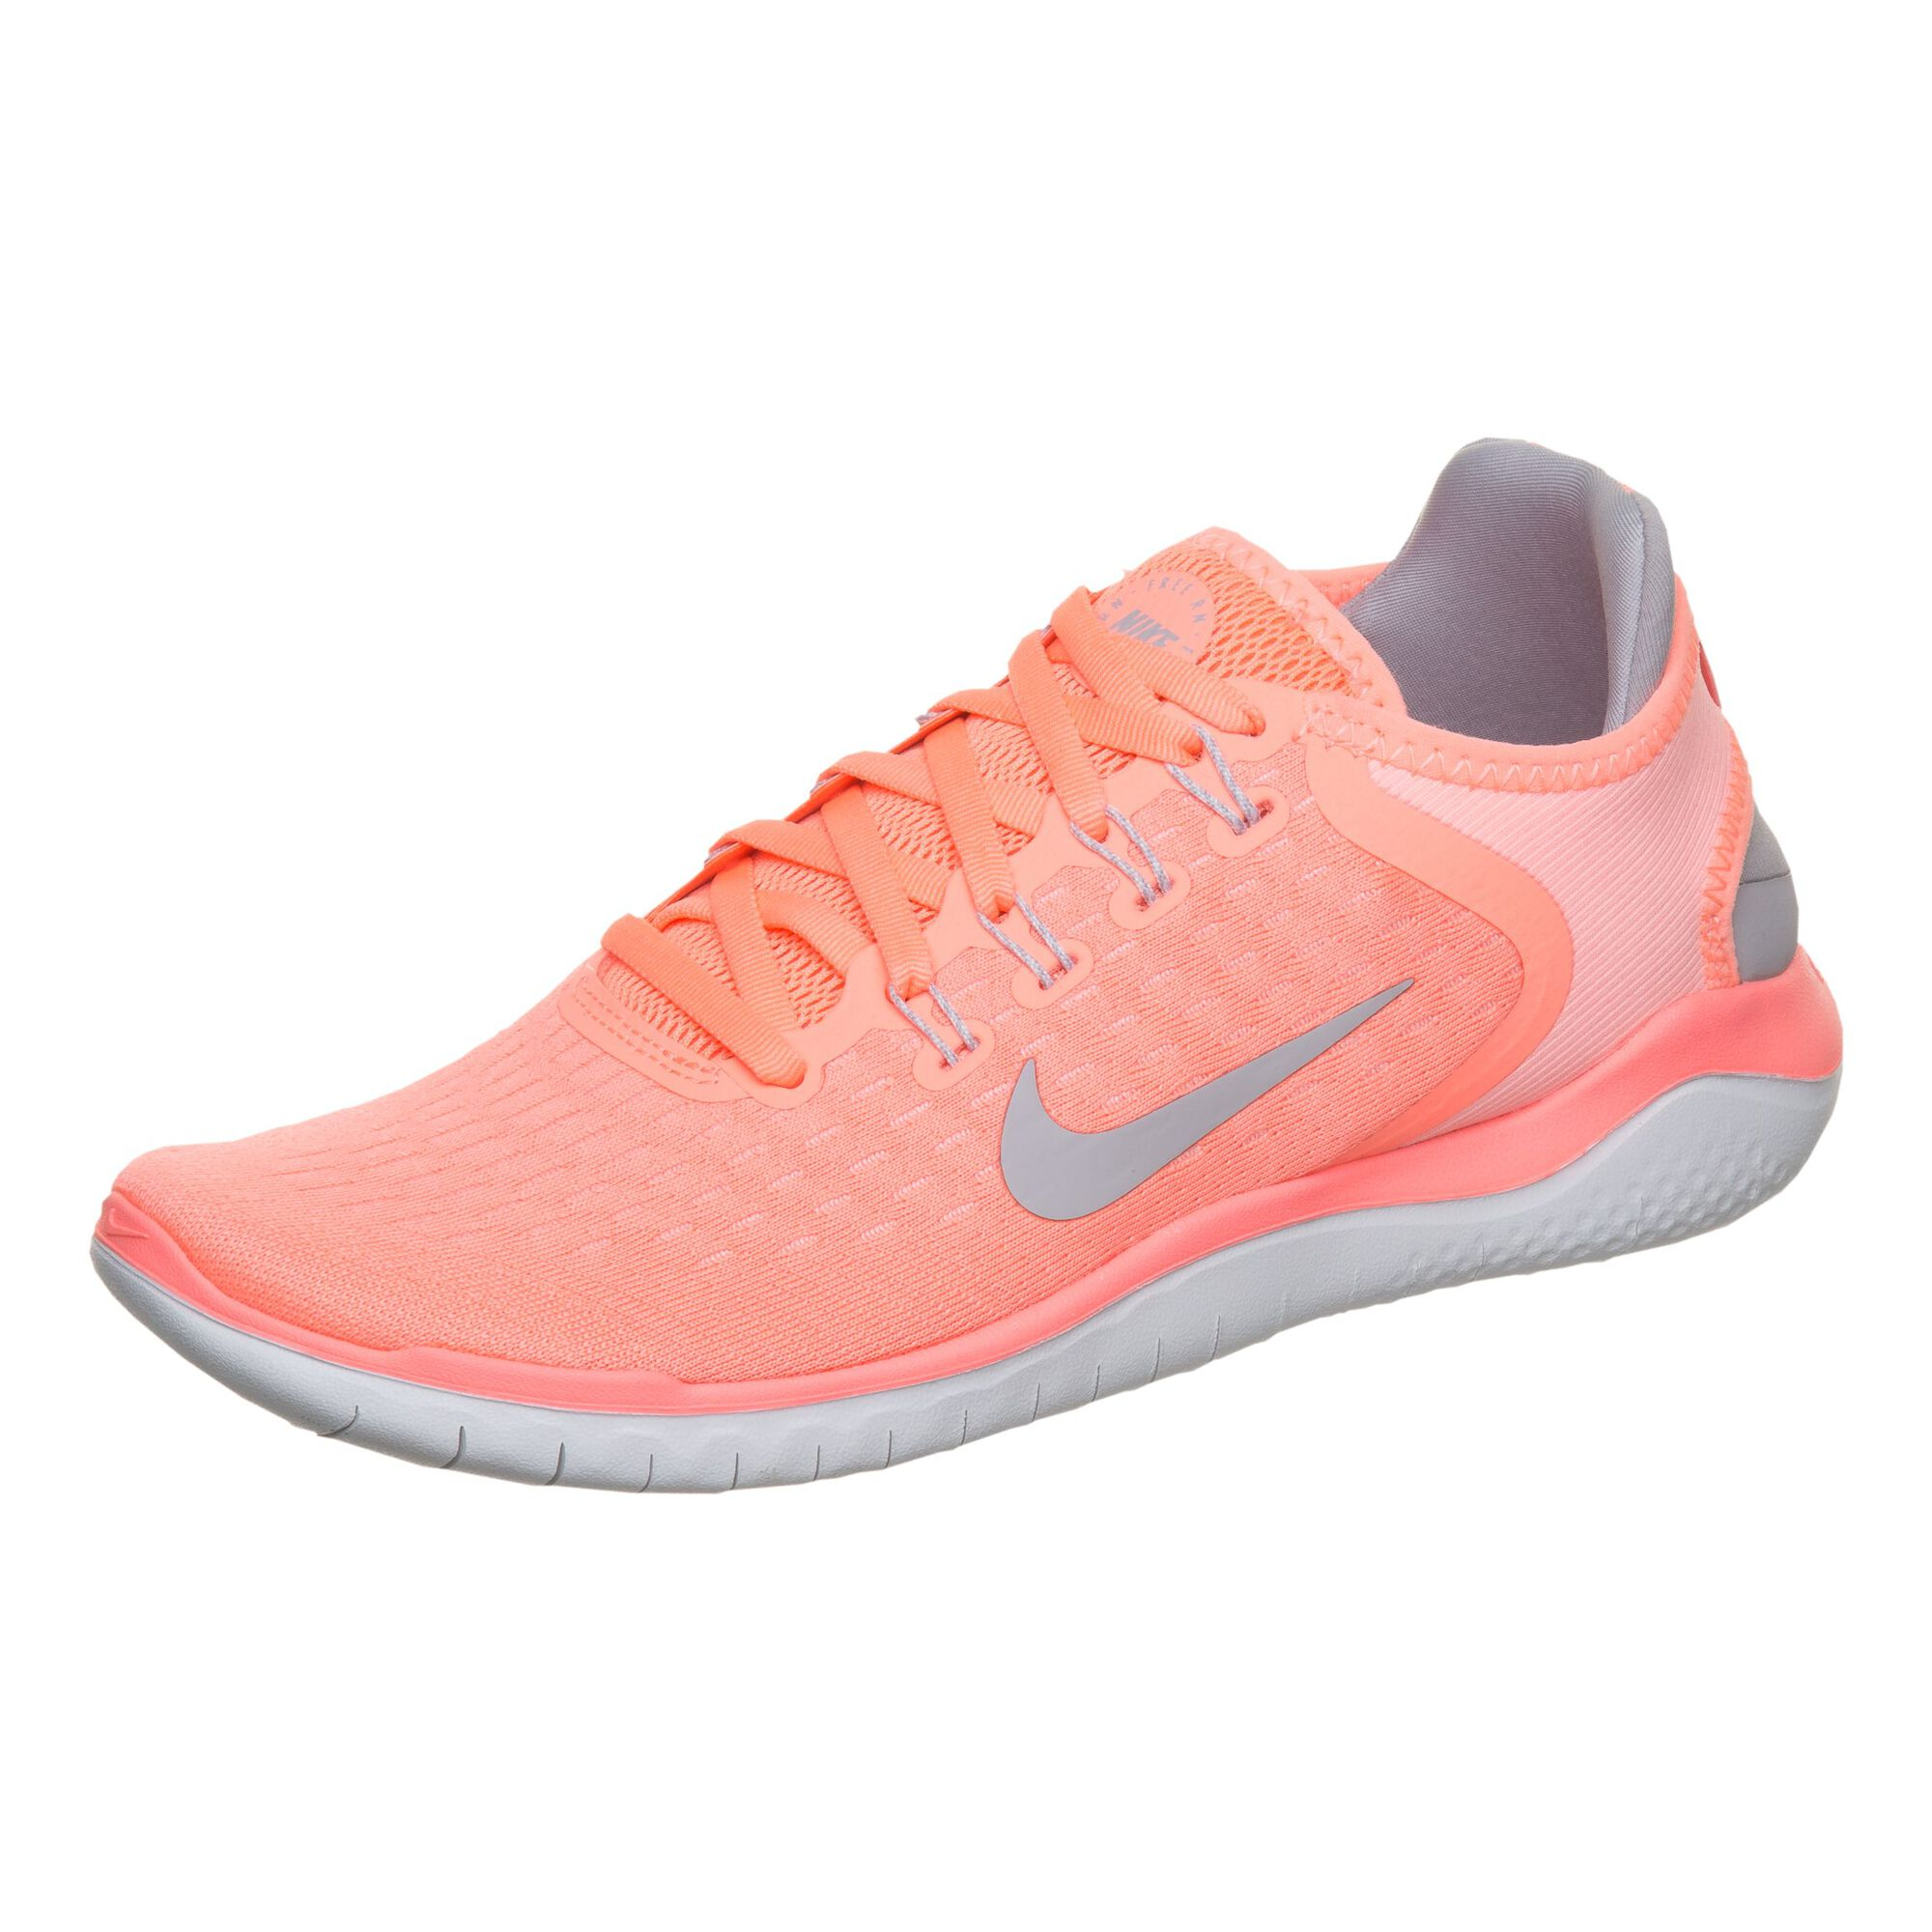 191e0c65c4a53 Nike  Nike  Nike  Nike  Nike  Nike  Nike  Nike  Nike  Nike. Free Run 2018  Women ...